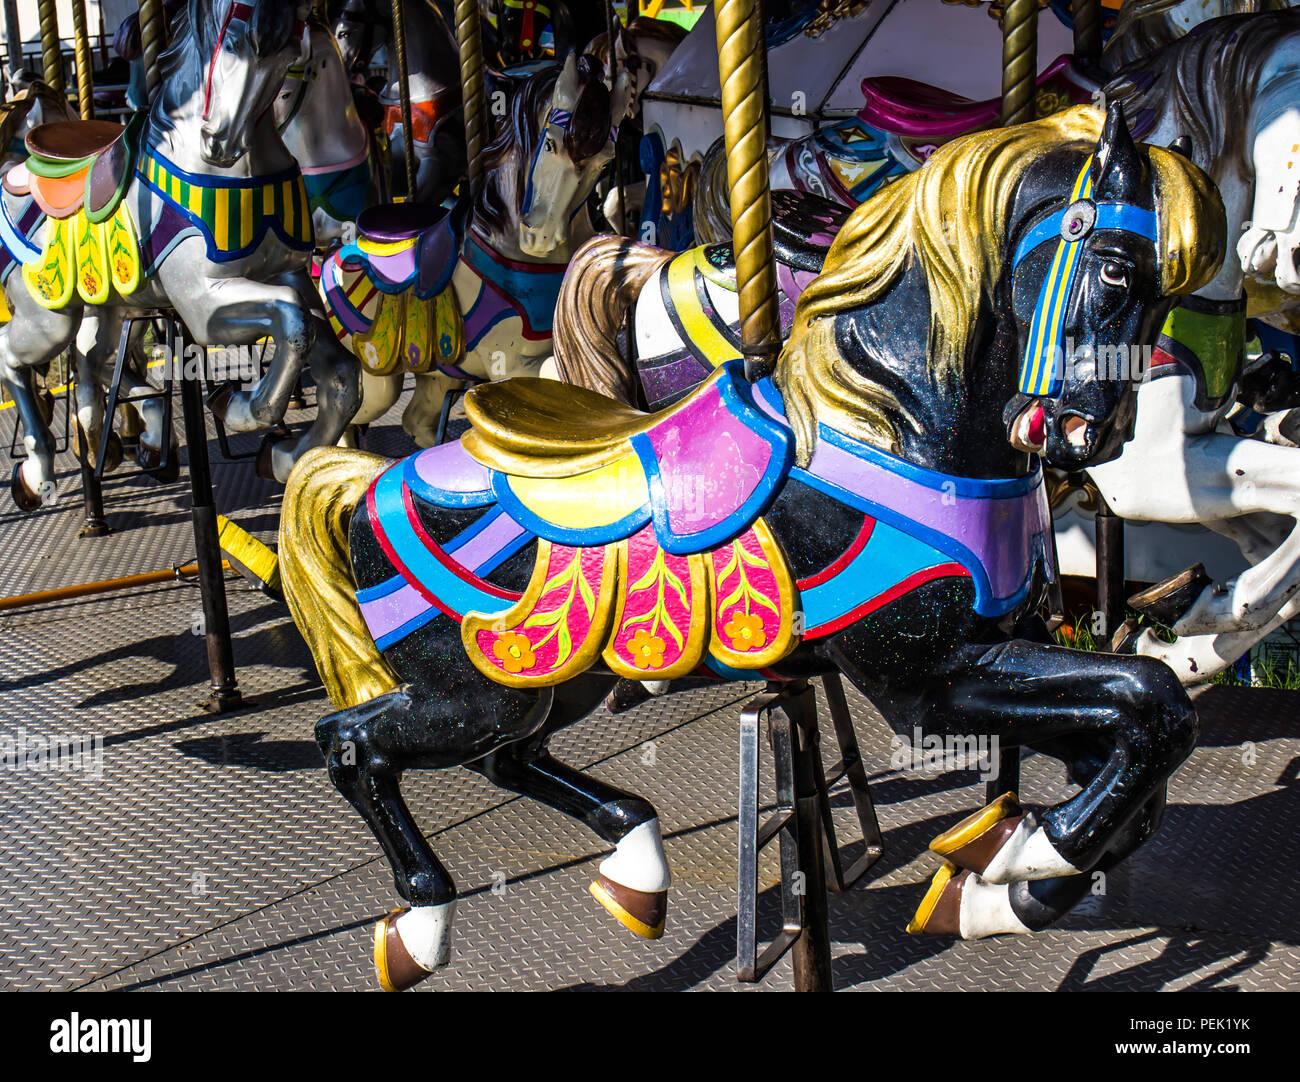 Black Horse On Merry Go Round Carousel Stock Photo Alamy